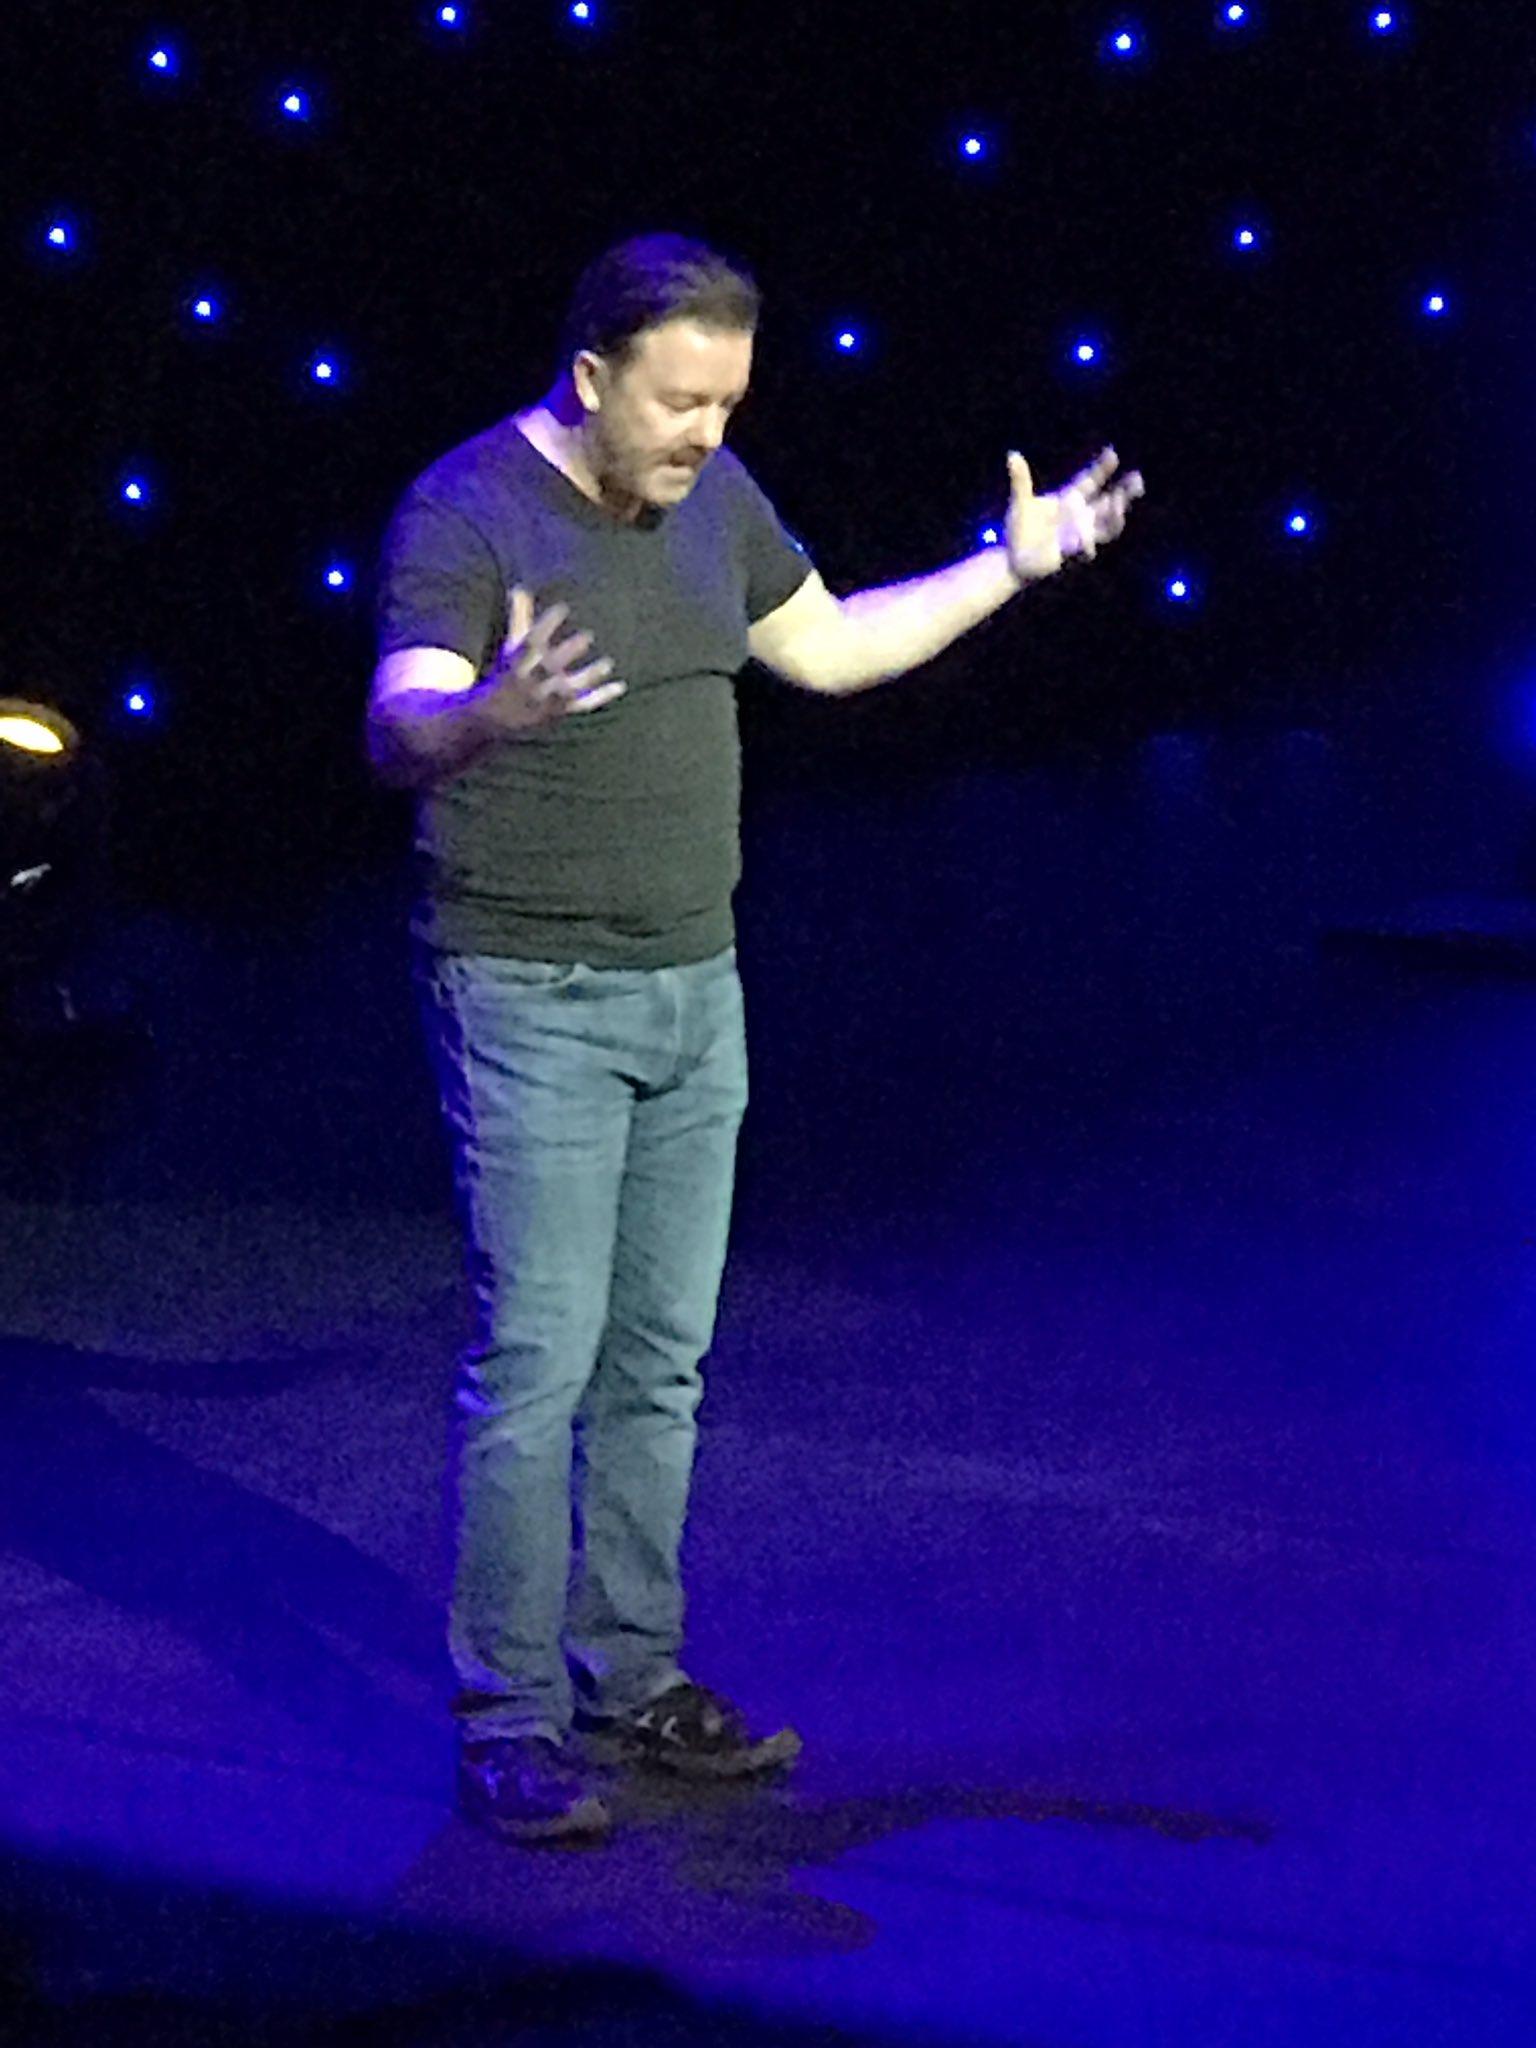 RT @preetbanerjee: 10/10 on @rickygervais' new standup show Humanity! https://t.co/Z58gB0nRFV